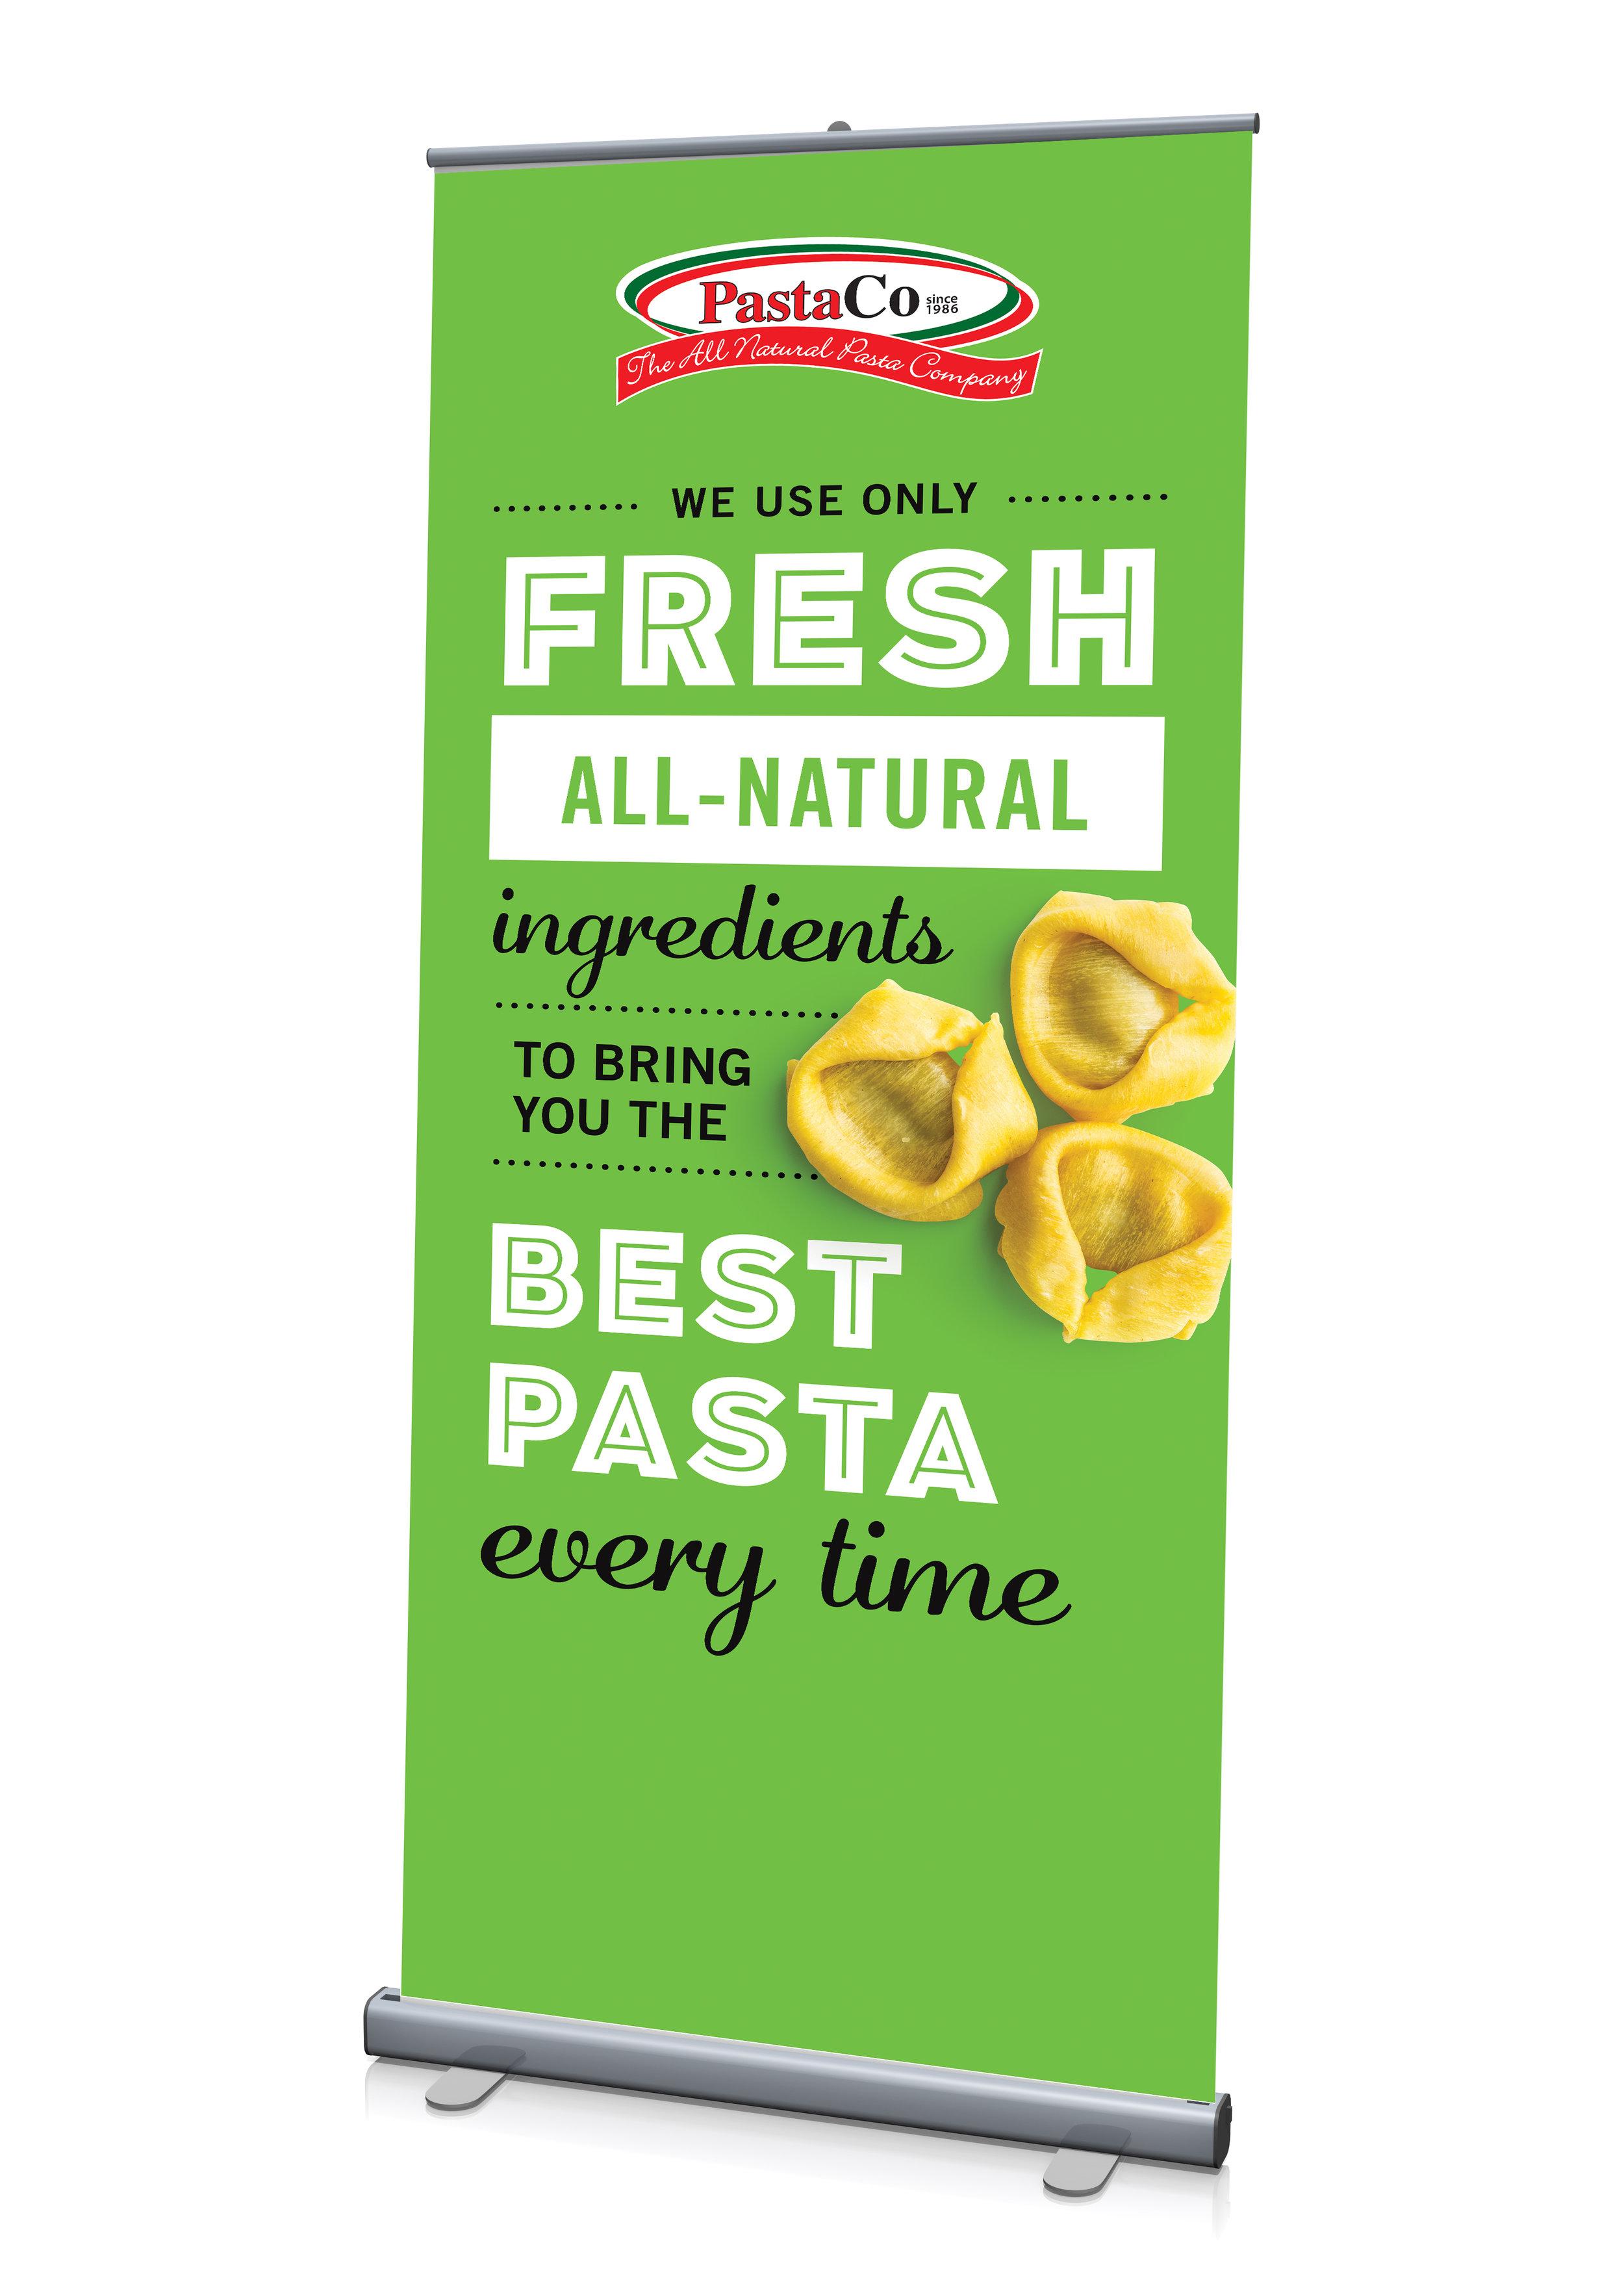 Pasta Co. Tradeshow Banner design